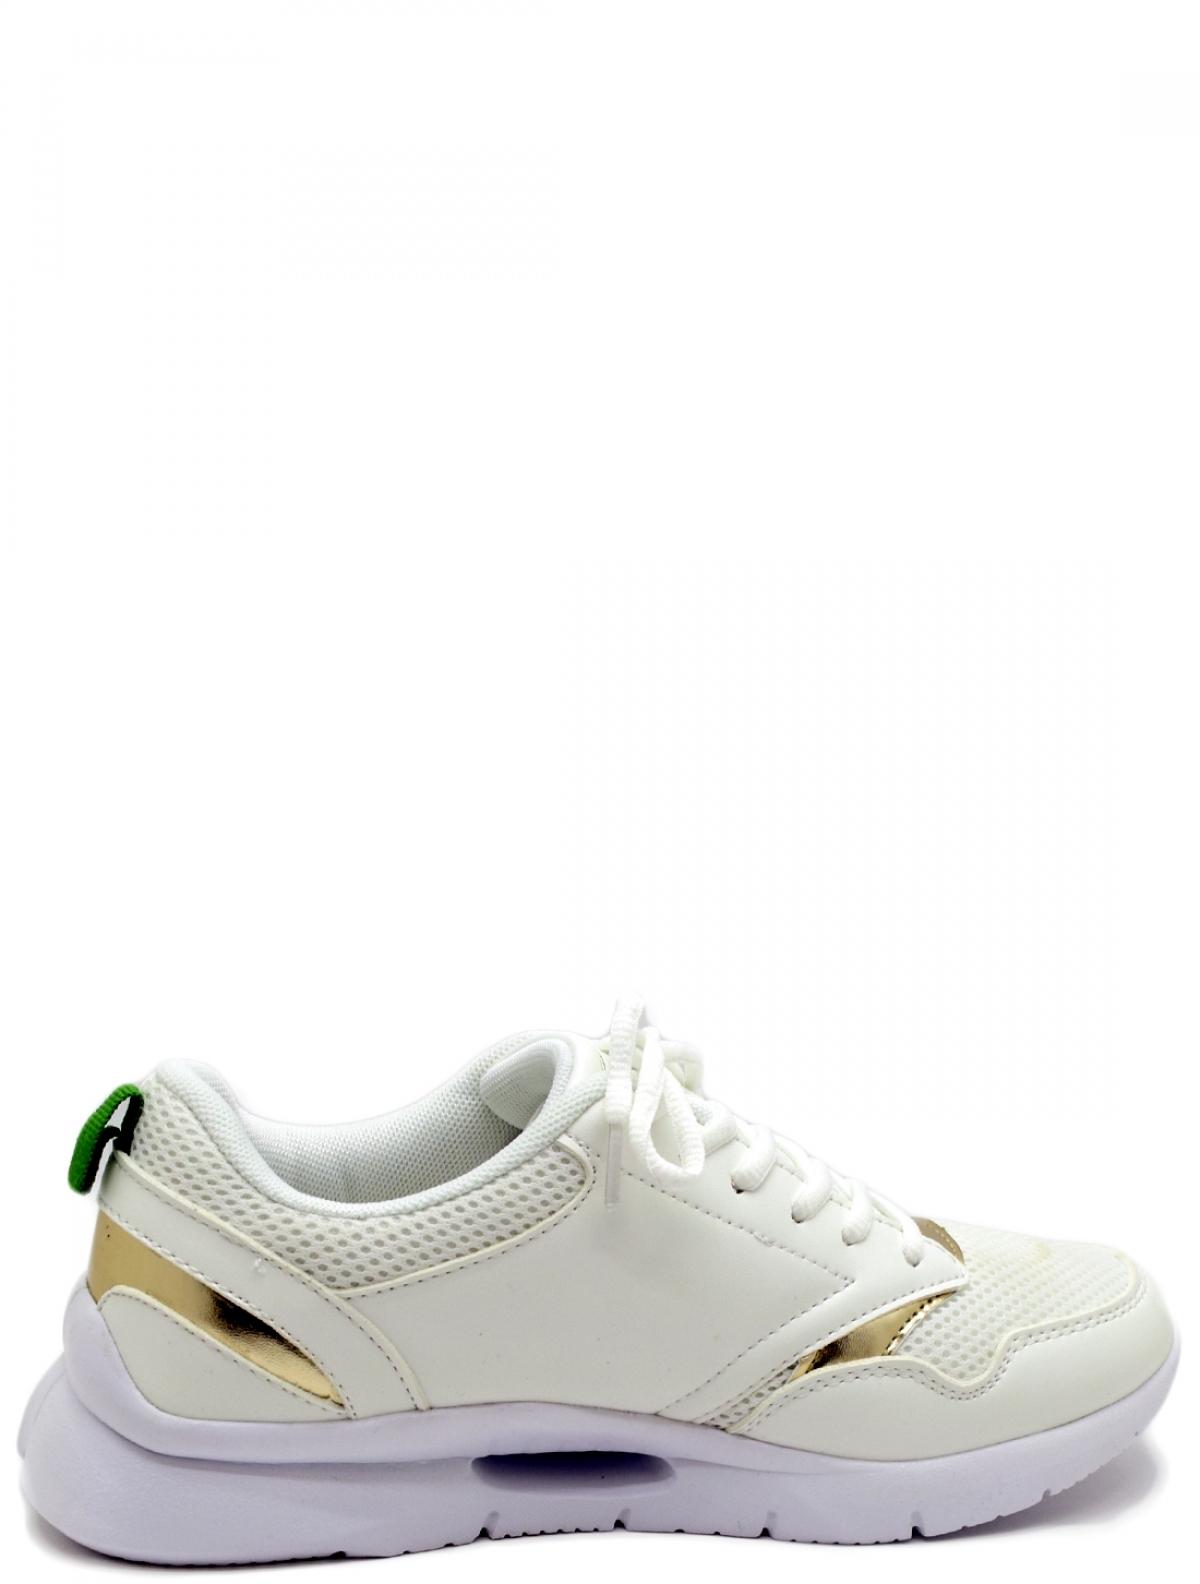 Trien 806145 женские кроссовки